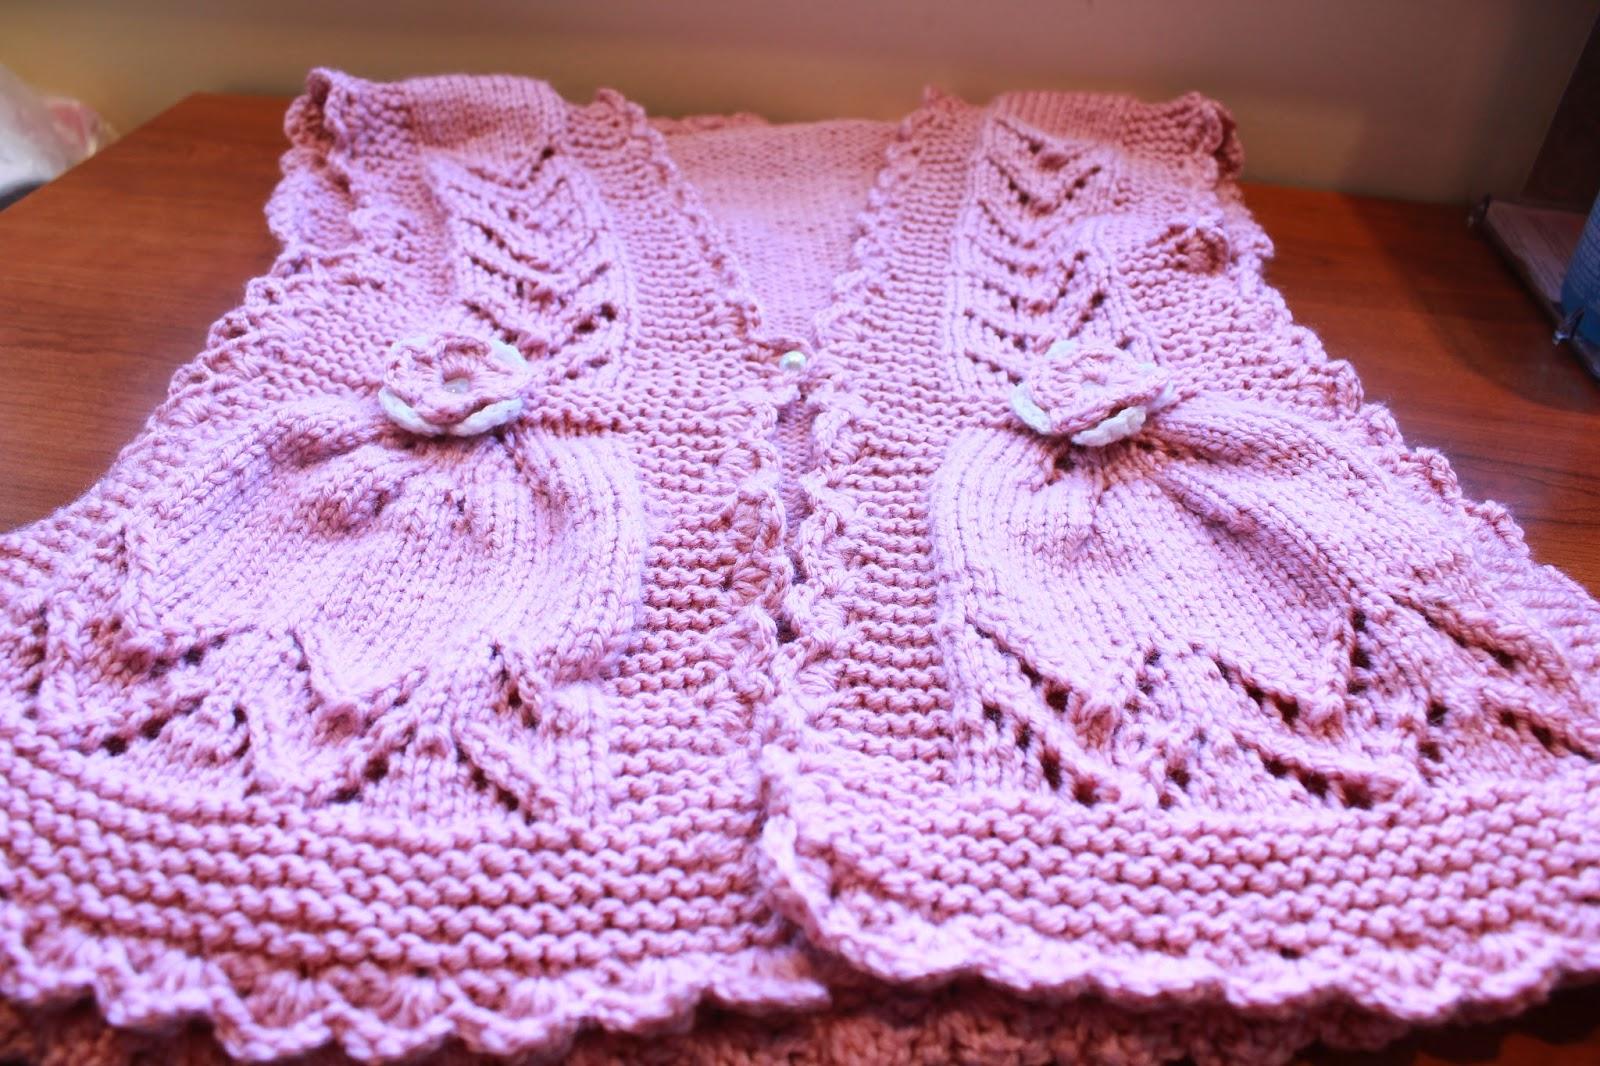 Vandyke Lace Knitting Pattern : Funky Girls Handmade Shop: Knit Pink Integrated Vandyke ...